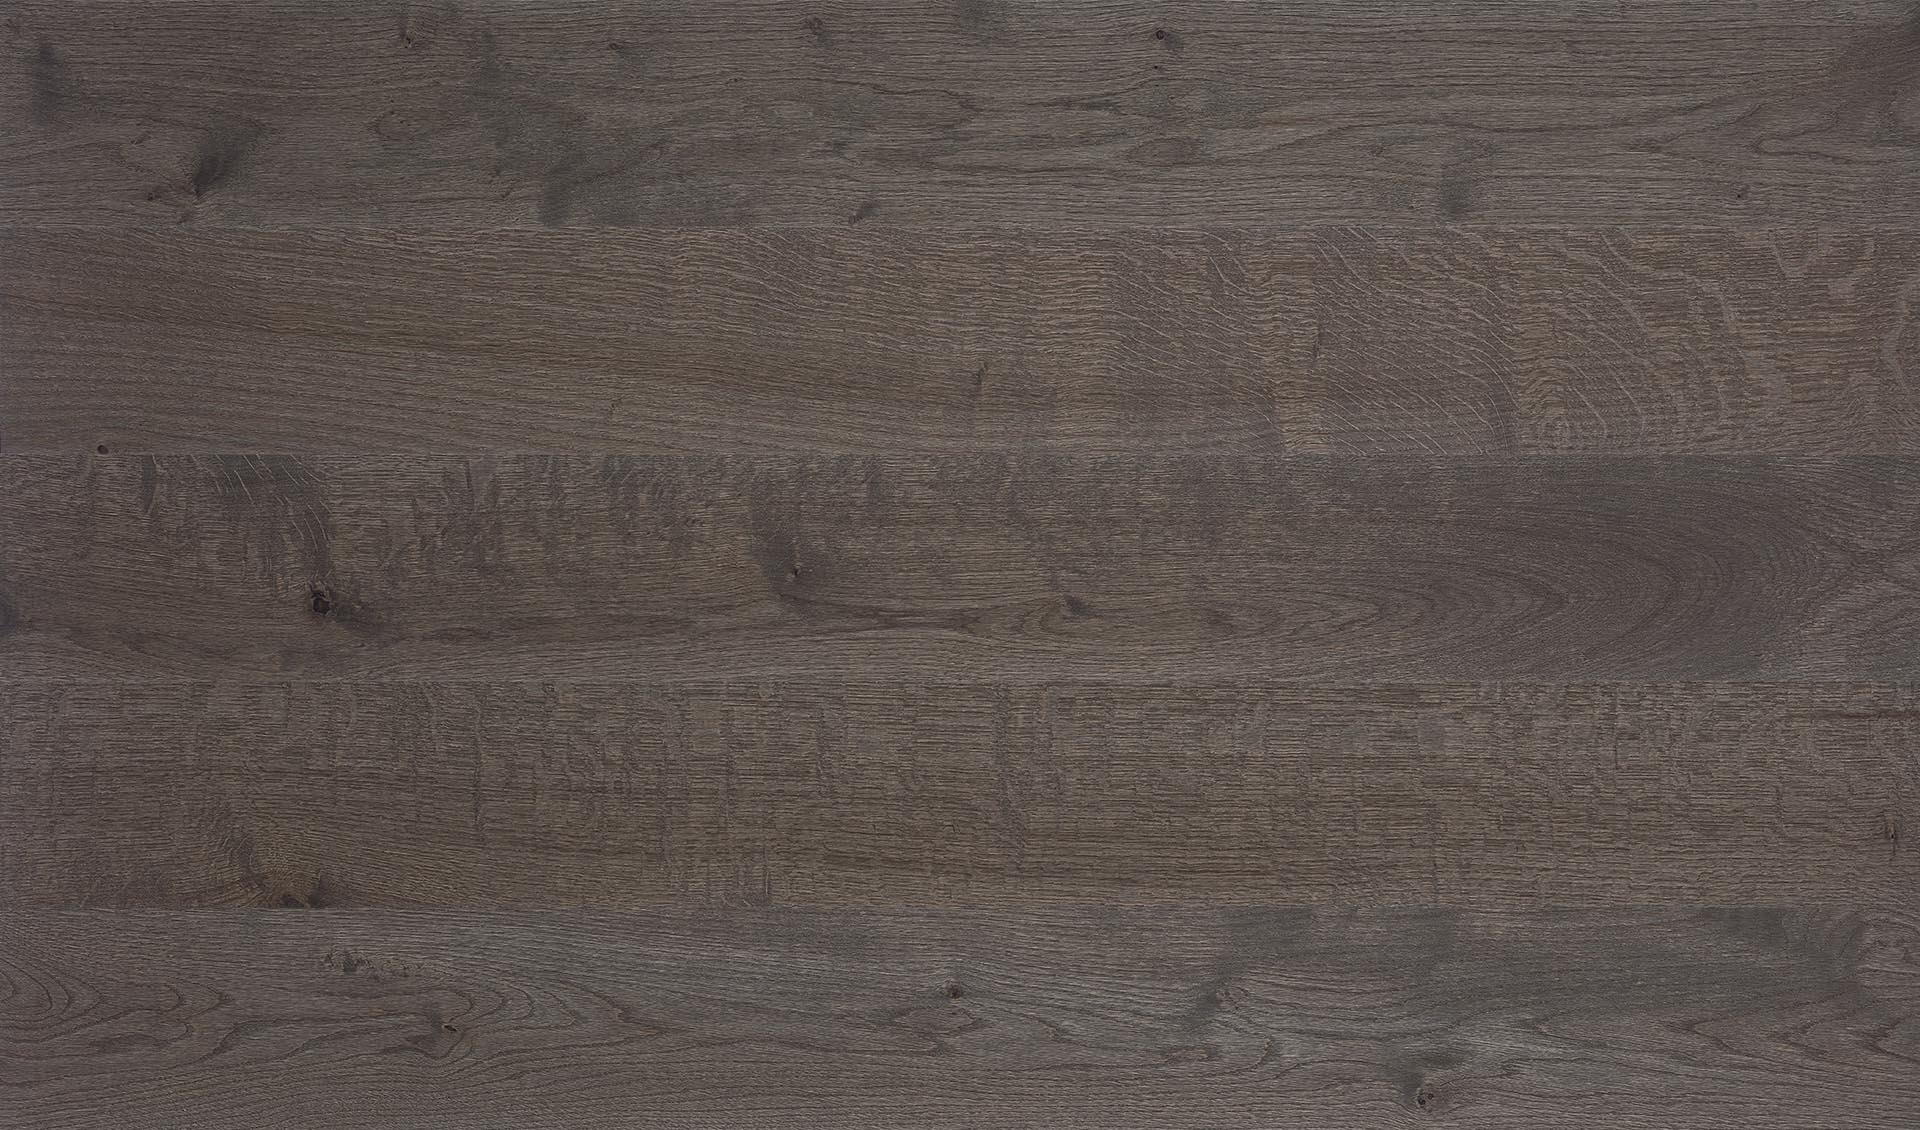 Parquet Rovere naturale grigio chiaro Grisaglie